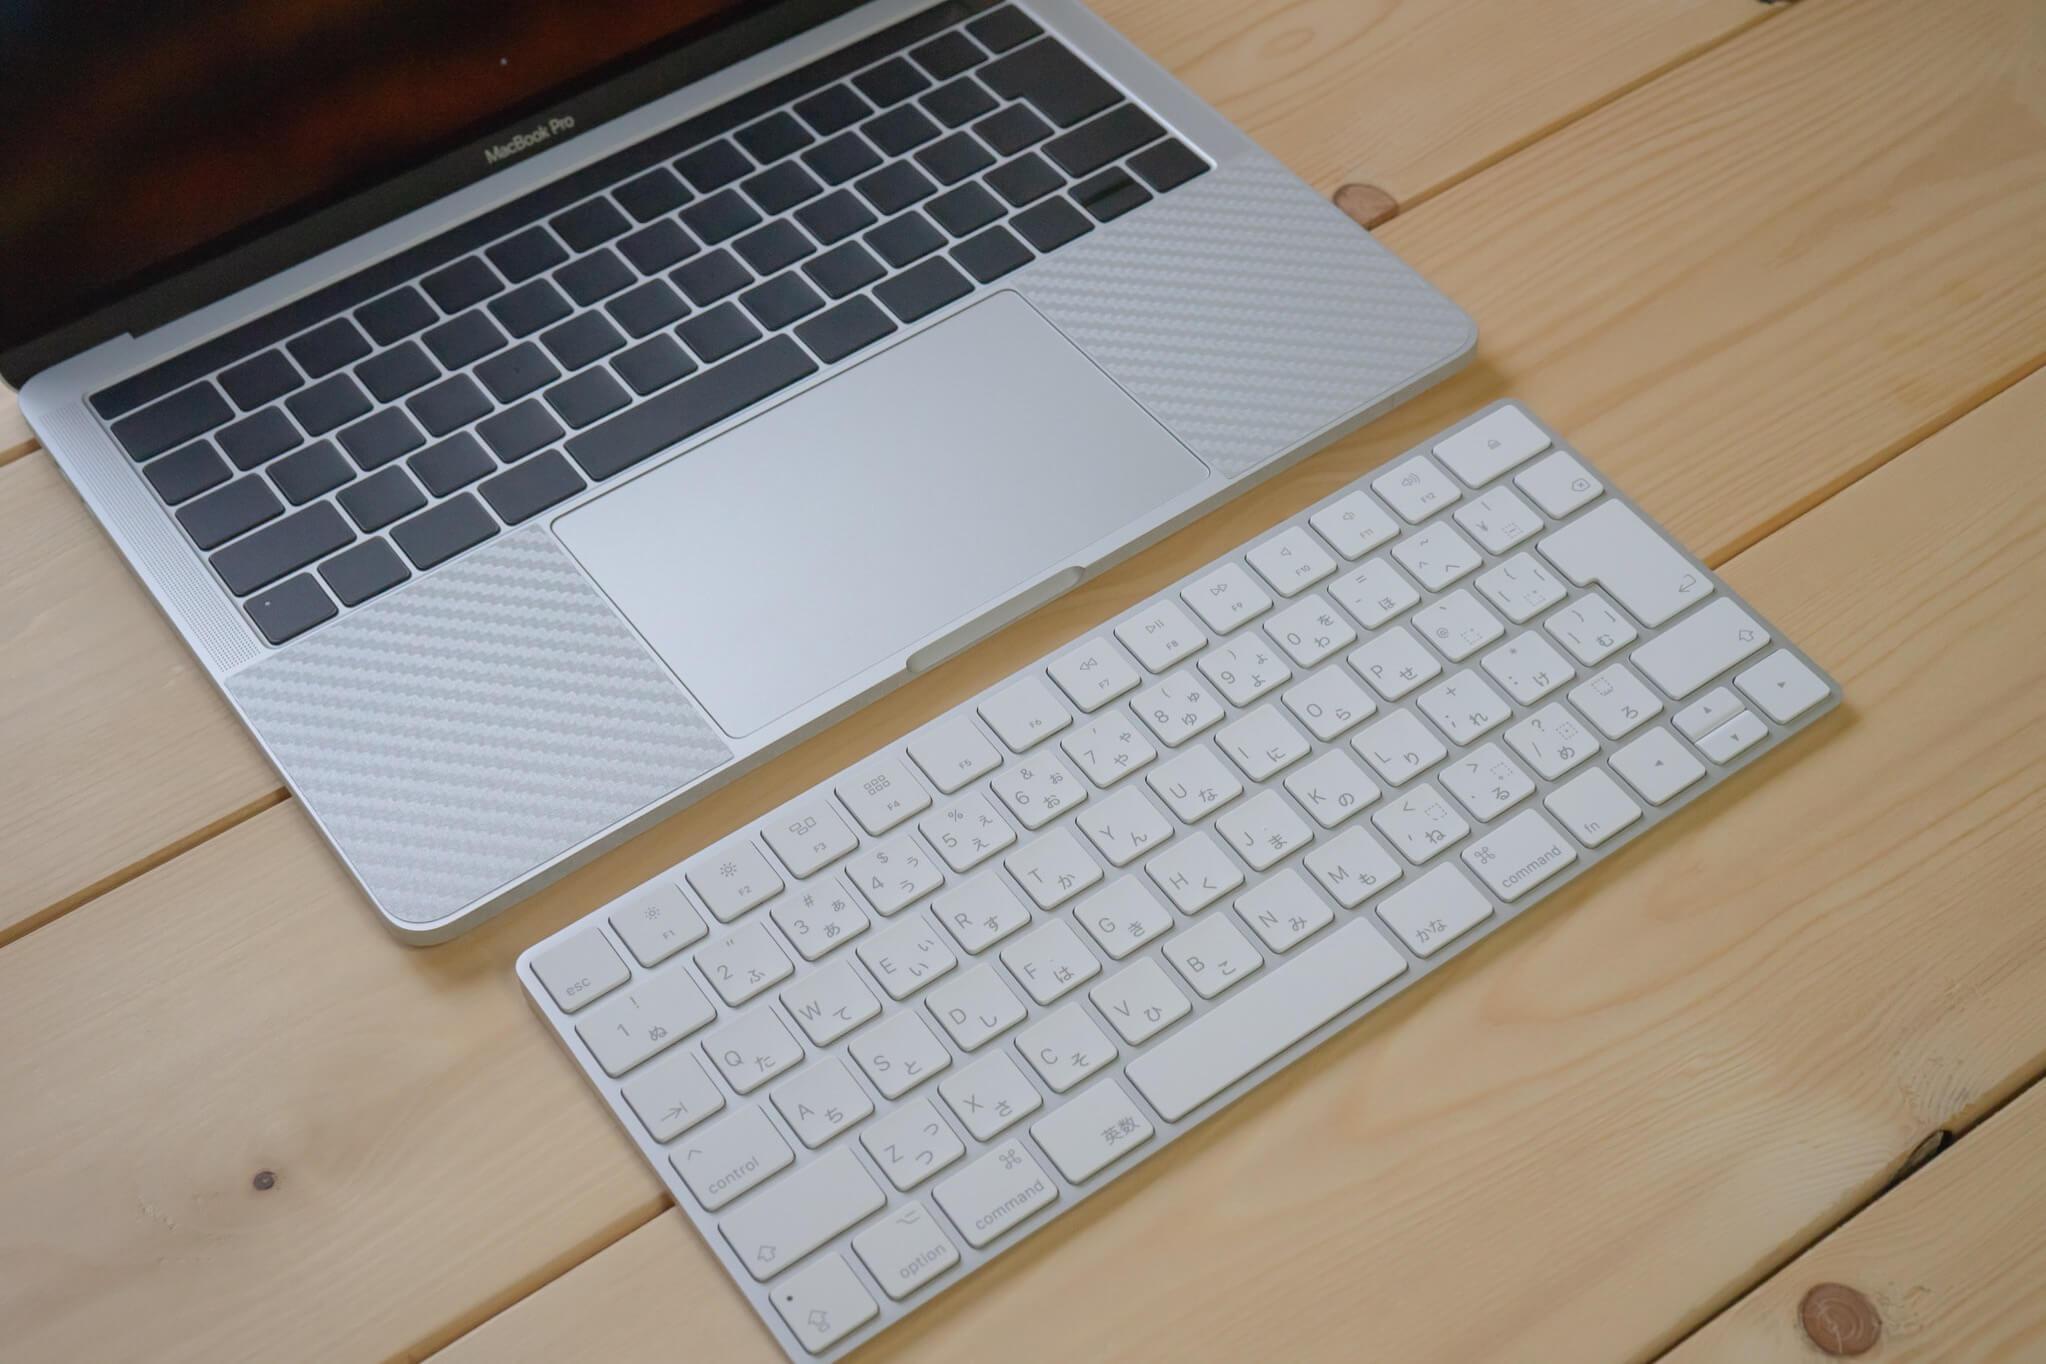 180816 magic keyboard 7